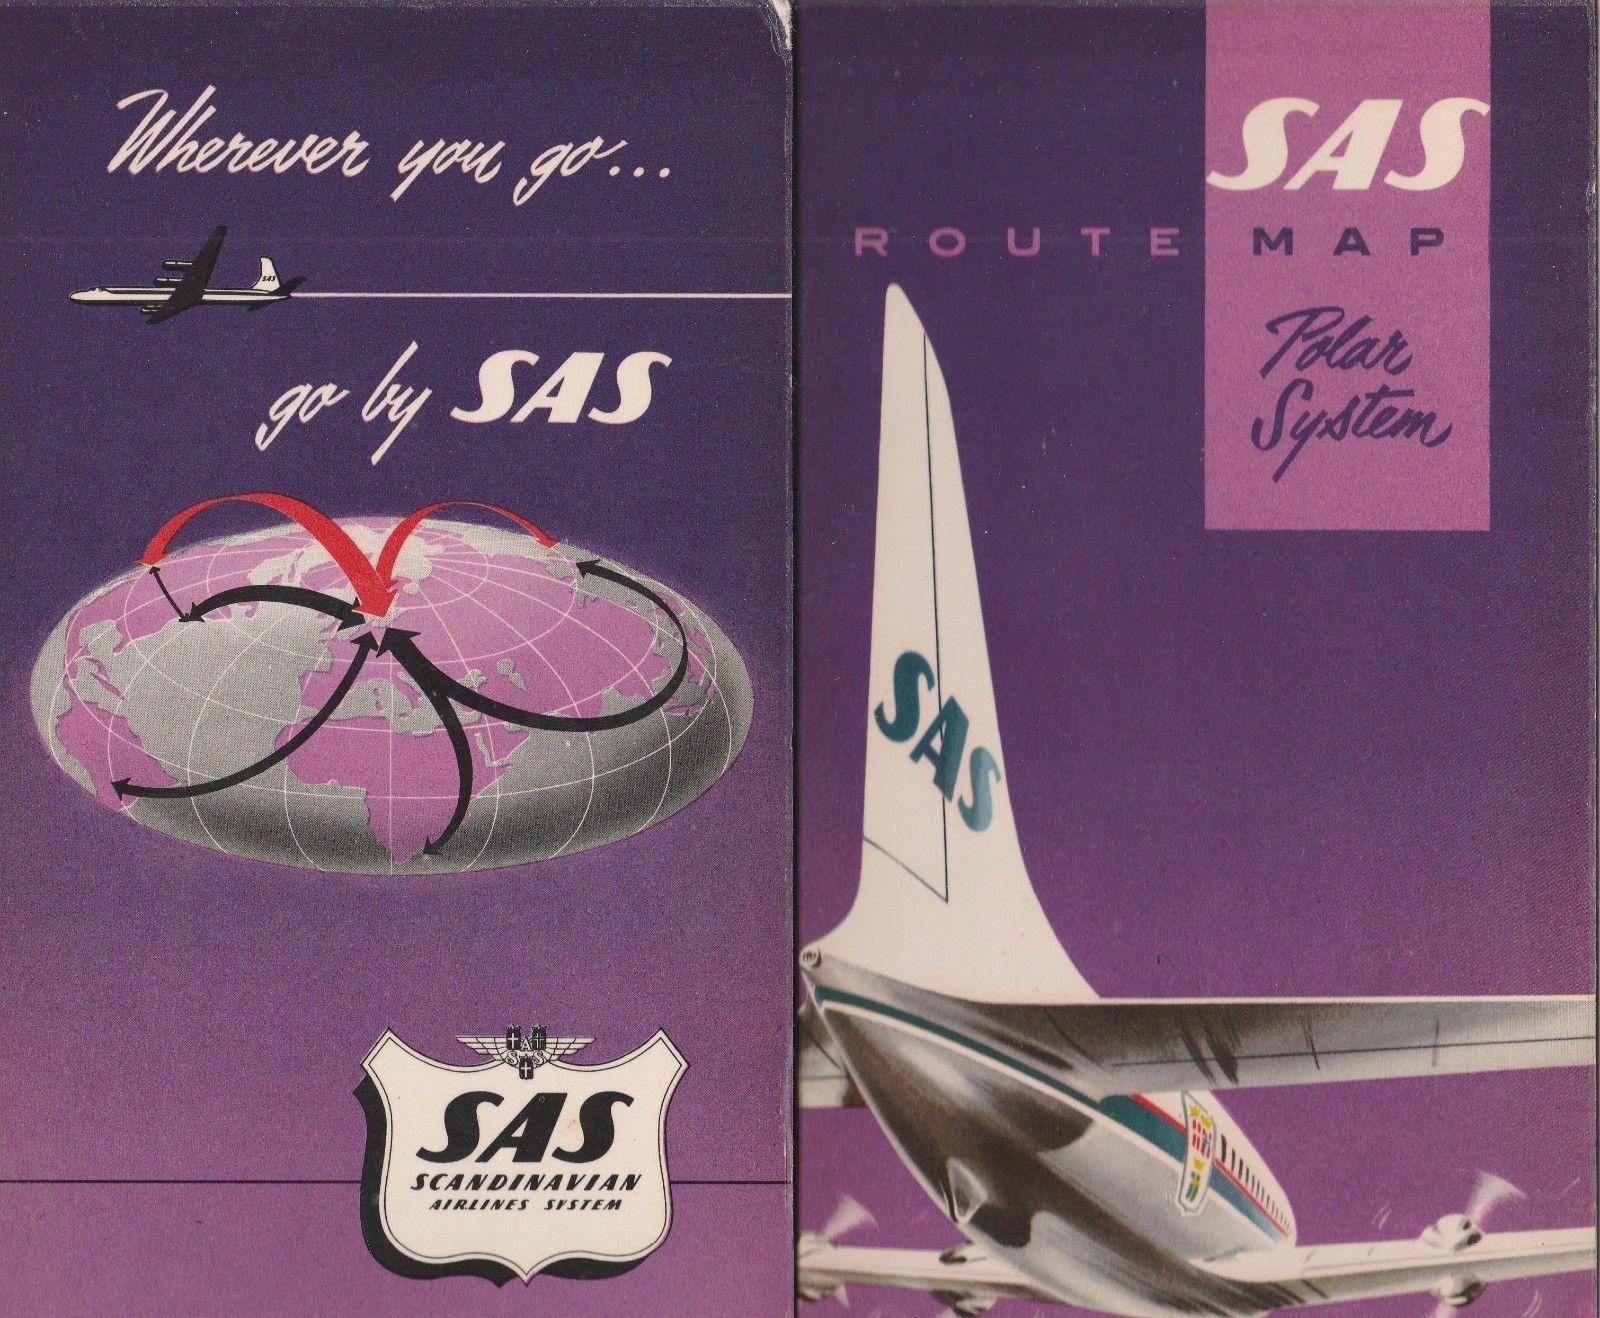 SAS THE GLOBAL AIRLINE 1960 POLAR SYSTEM